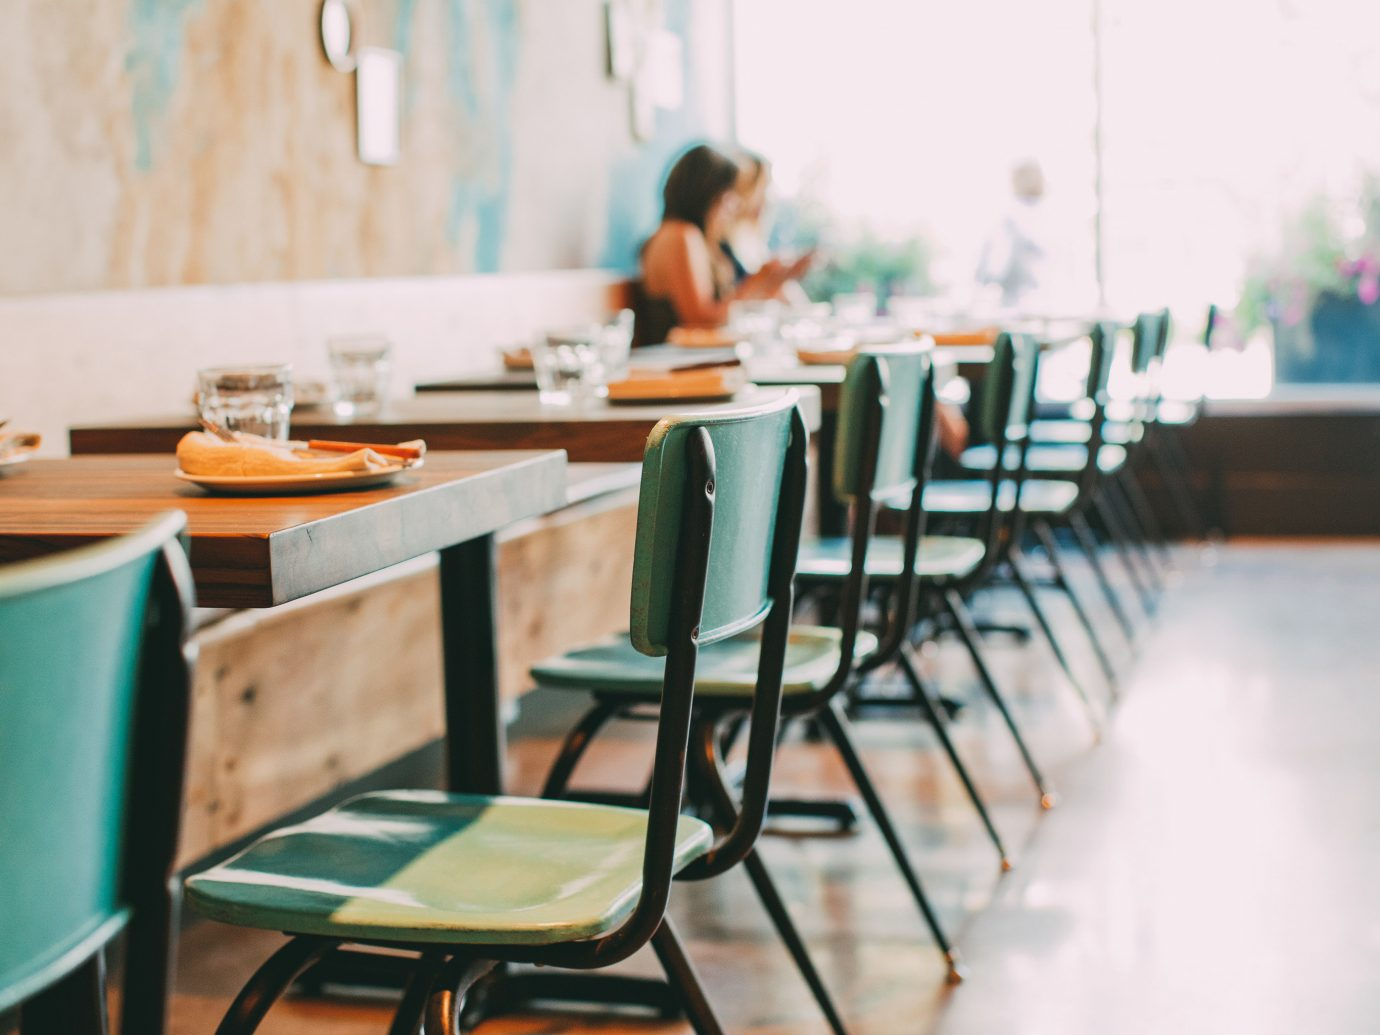 Alberta Canada Road Trips table color floor indoor room restaurant green Design interior design Dining meal classroom furniture dining table